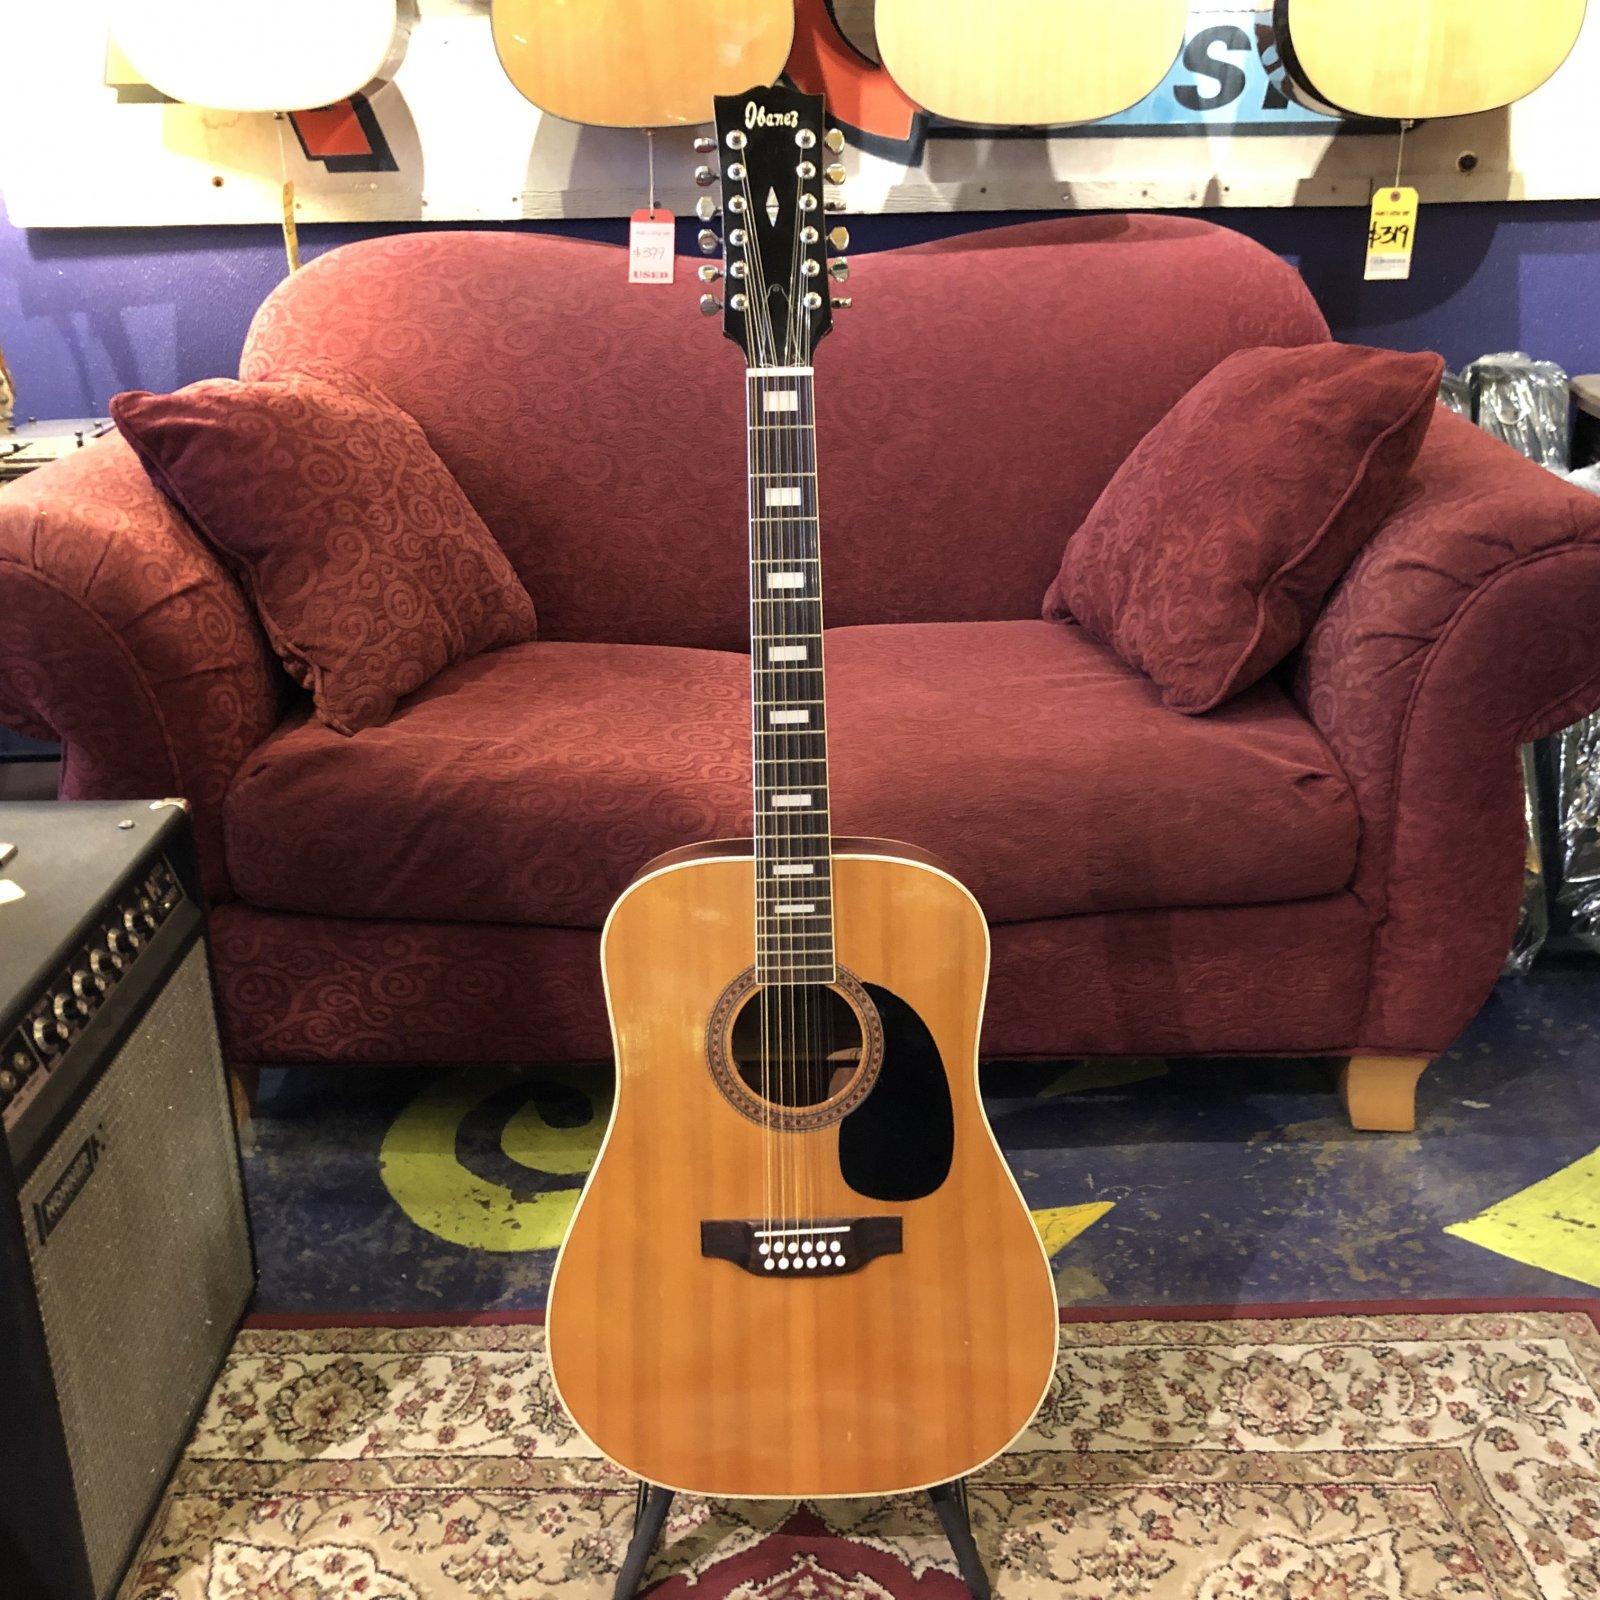 Used Ibanez 628-12 12-String Acoustic